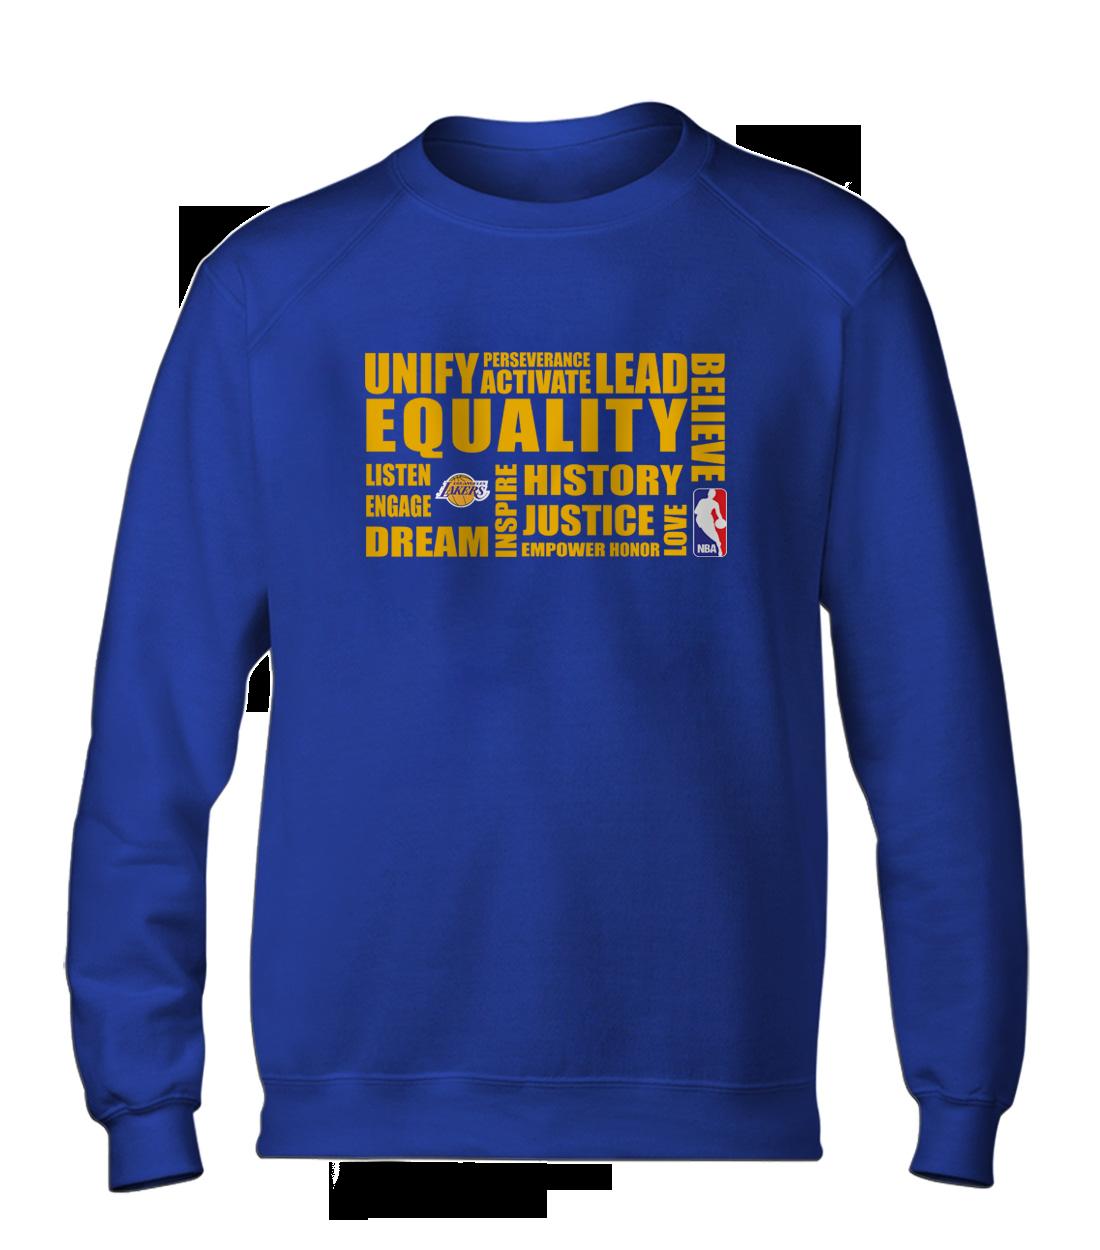 EQUALITY L.A. Lakers Basic (BSC-BLU-NP-290-NBA.LAL.yllw)